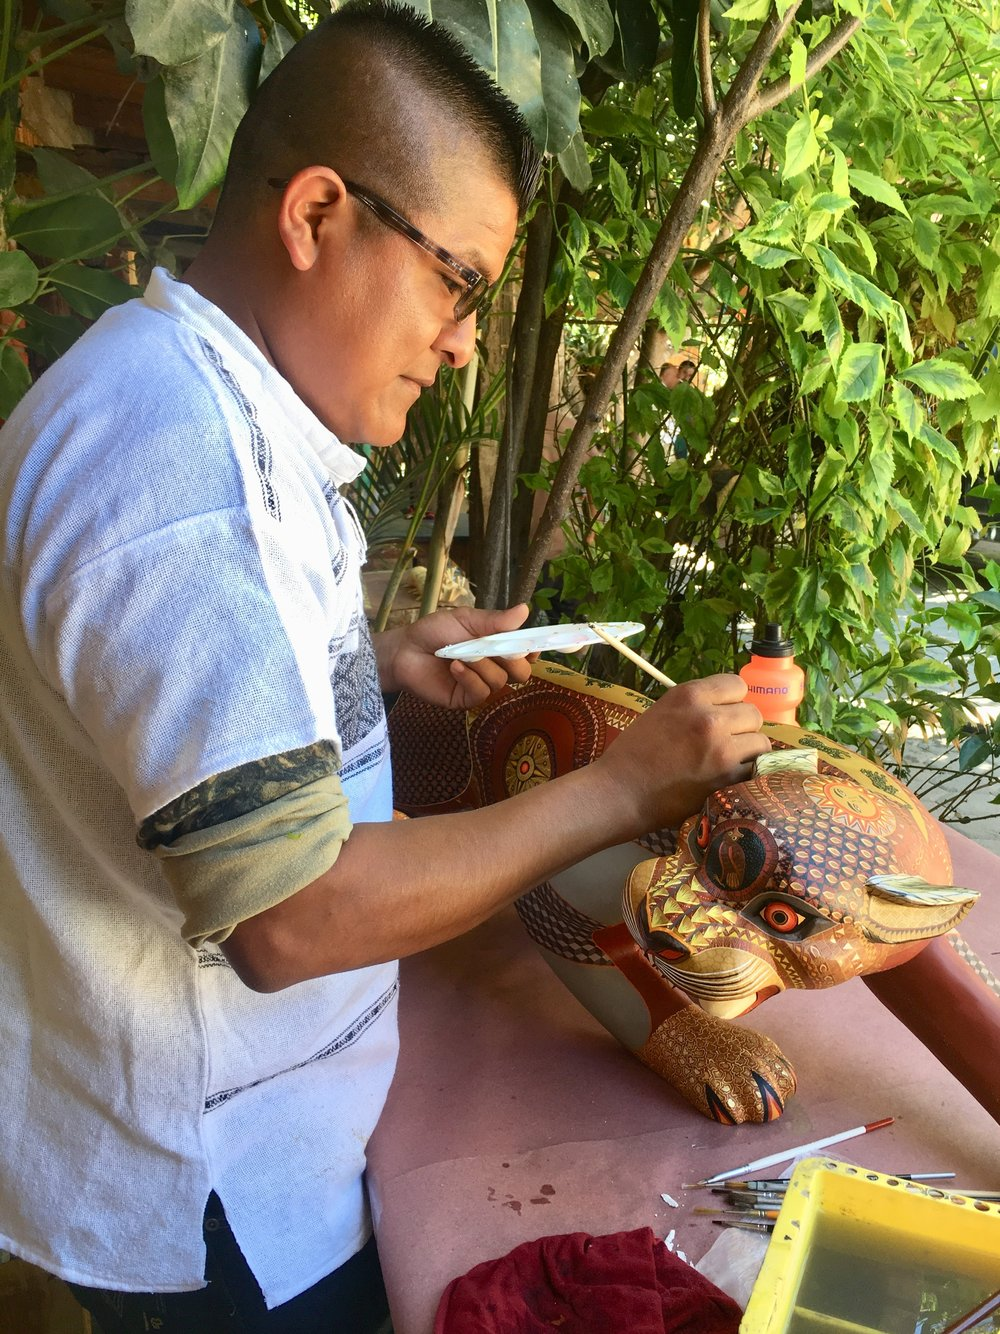 Local woodwork artist Oaxaca Mexico